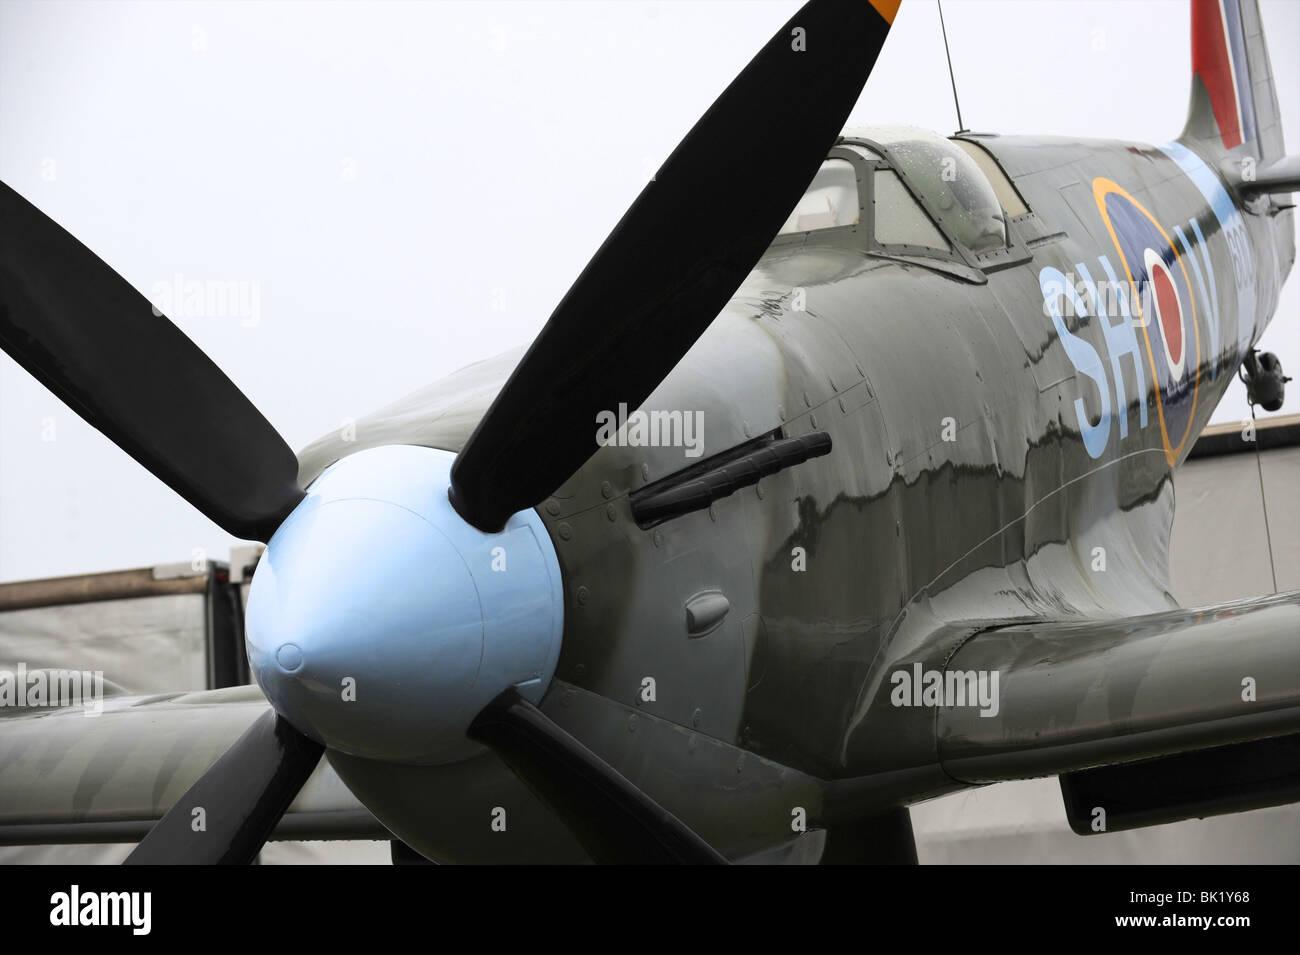 Spitfire gate Guardian at RAF Uxbridge - Stock Image